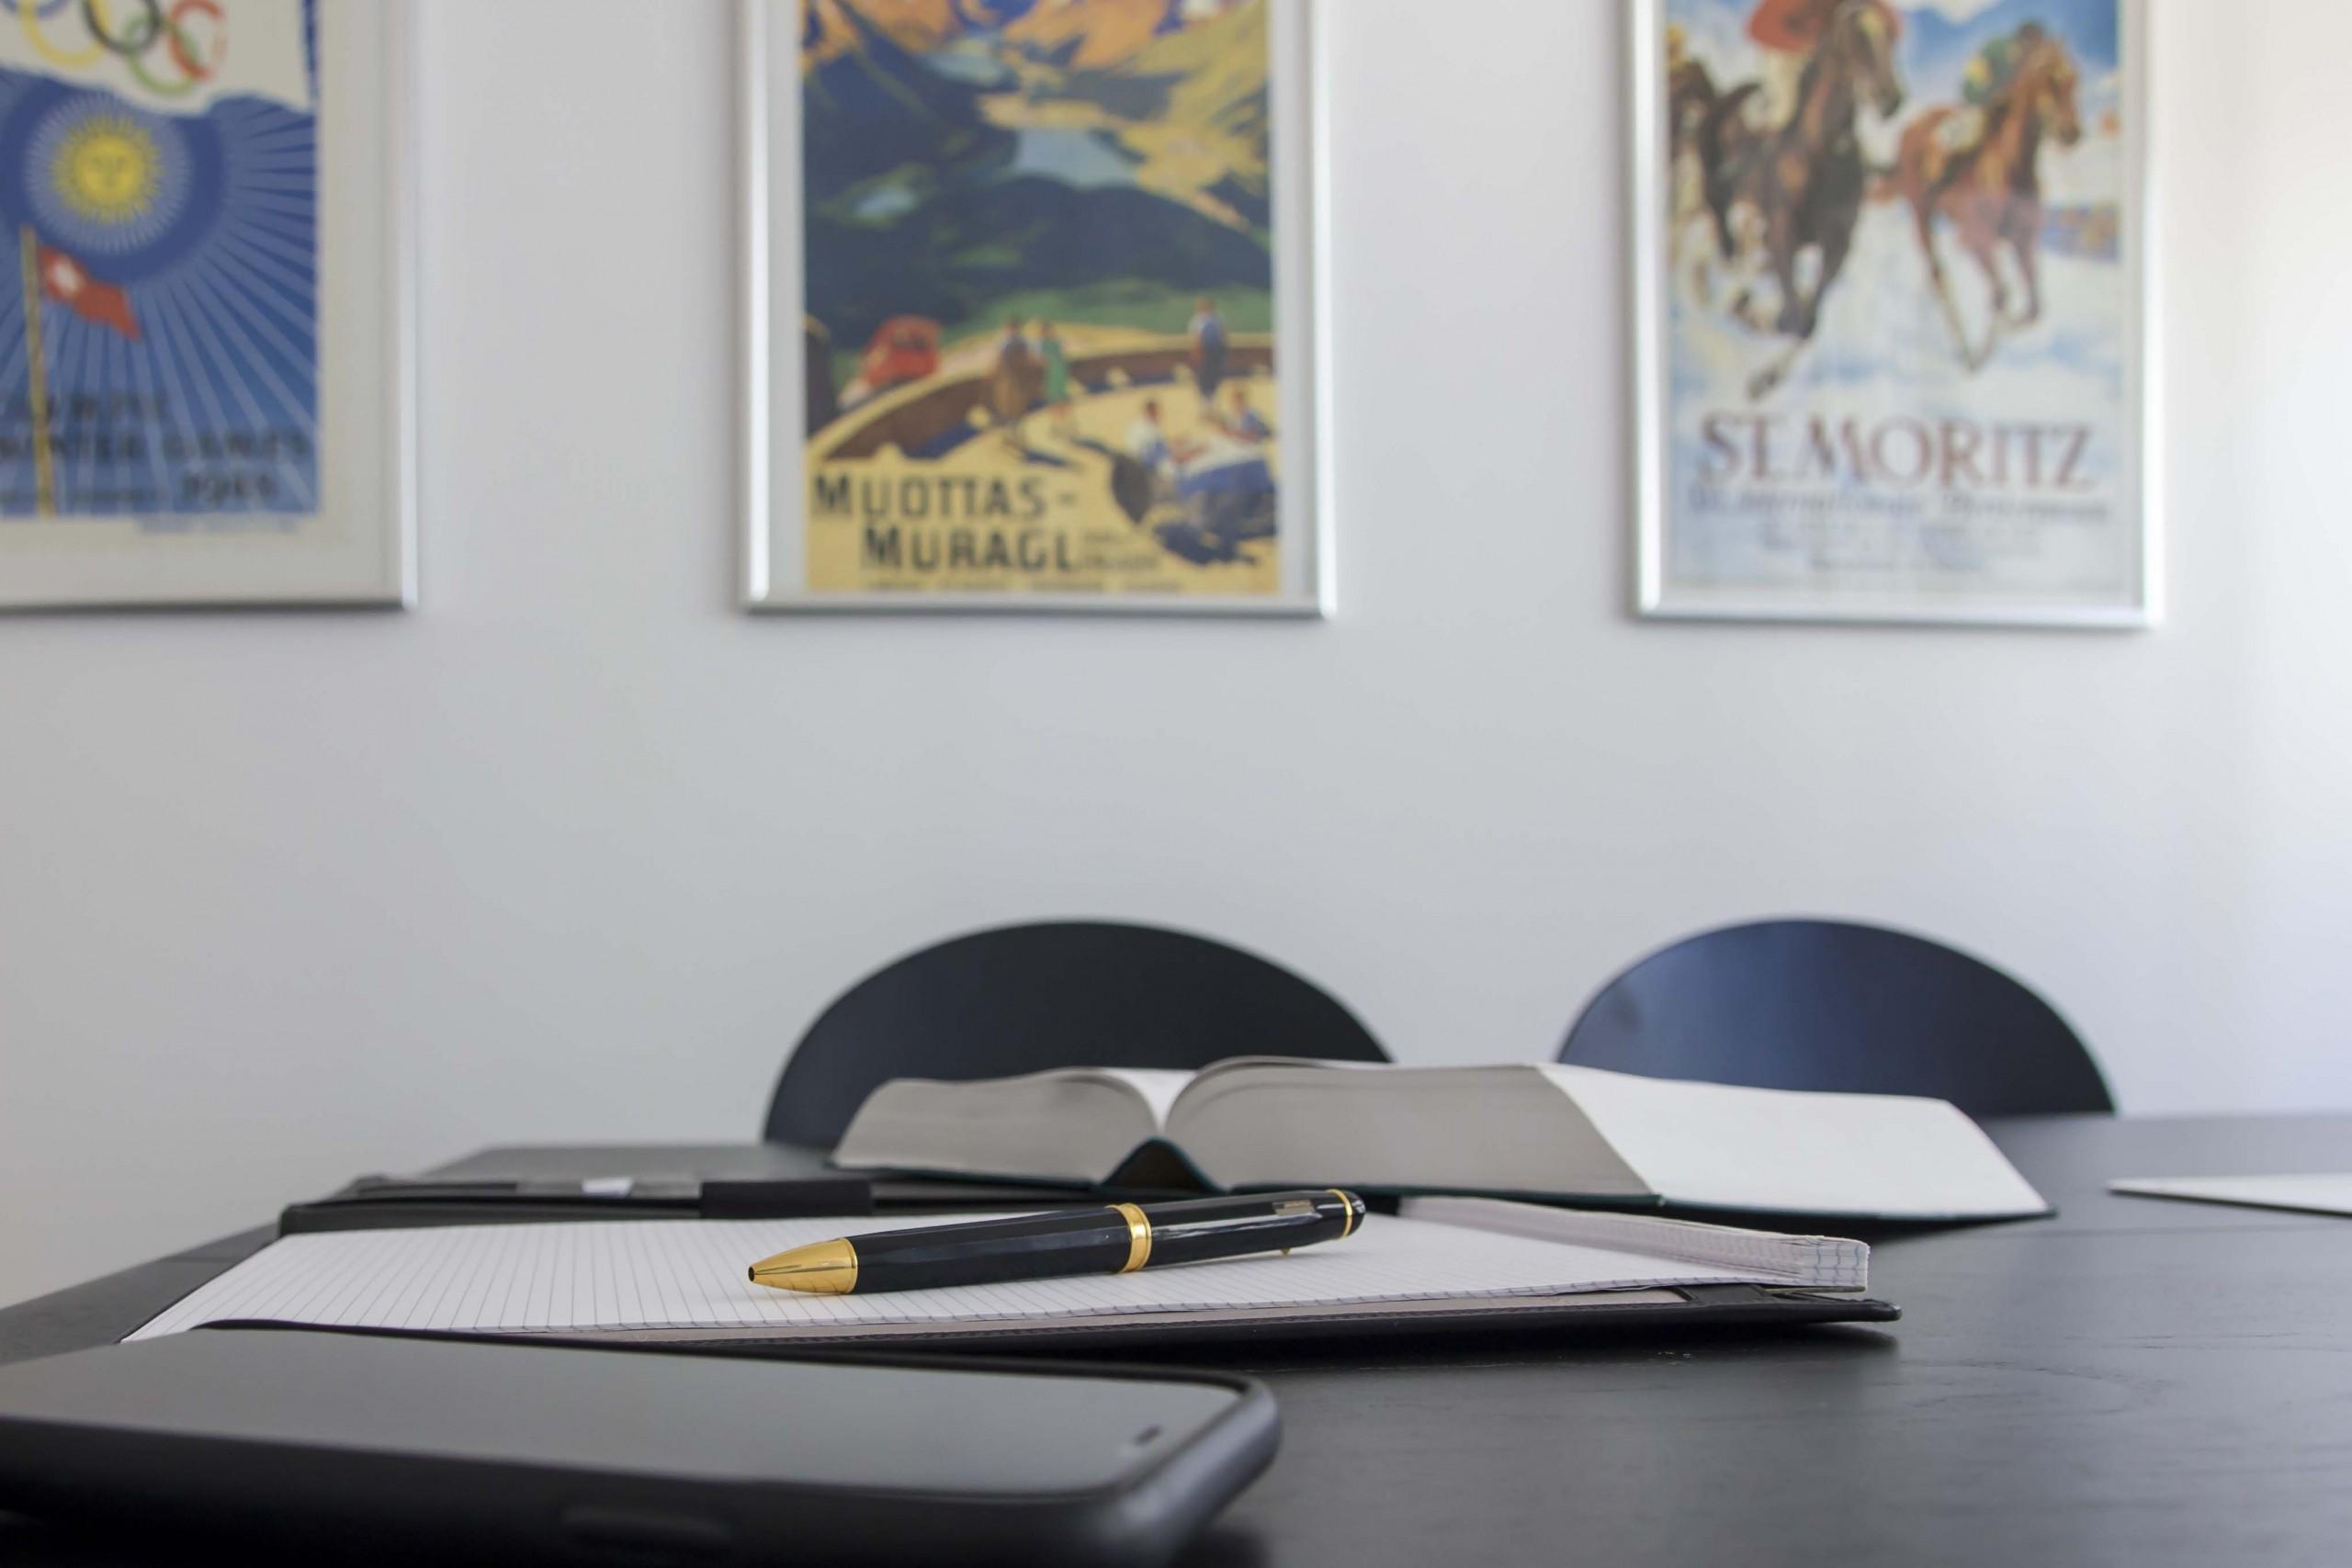 meyer & meier Rechtsanwälte: Anwaltskanzlei für Familienrecht (Scheidung, Trennung, Kinderbelange), Mietrecht, Vertragsrecht, Arbeitsrecht, Strafrecht, Erbrecht, Schuldbetreibungs- und Konkursrecht, Gesellschaftsrecht und Migrationsrecht